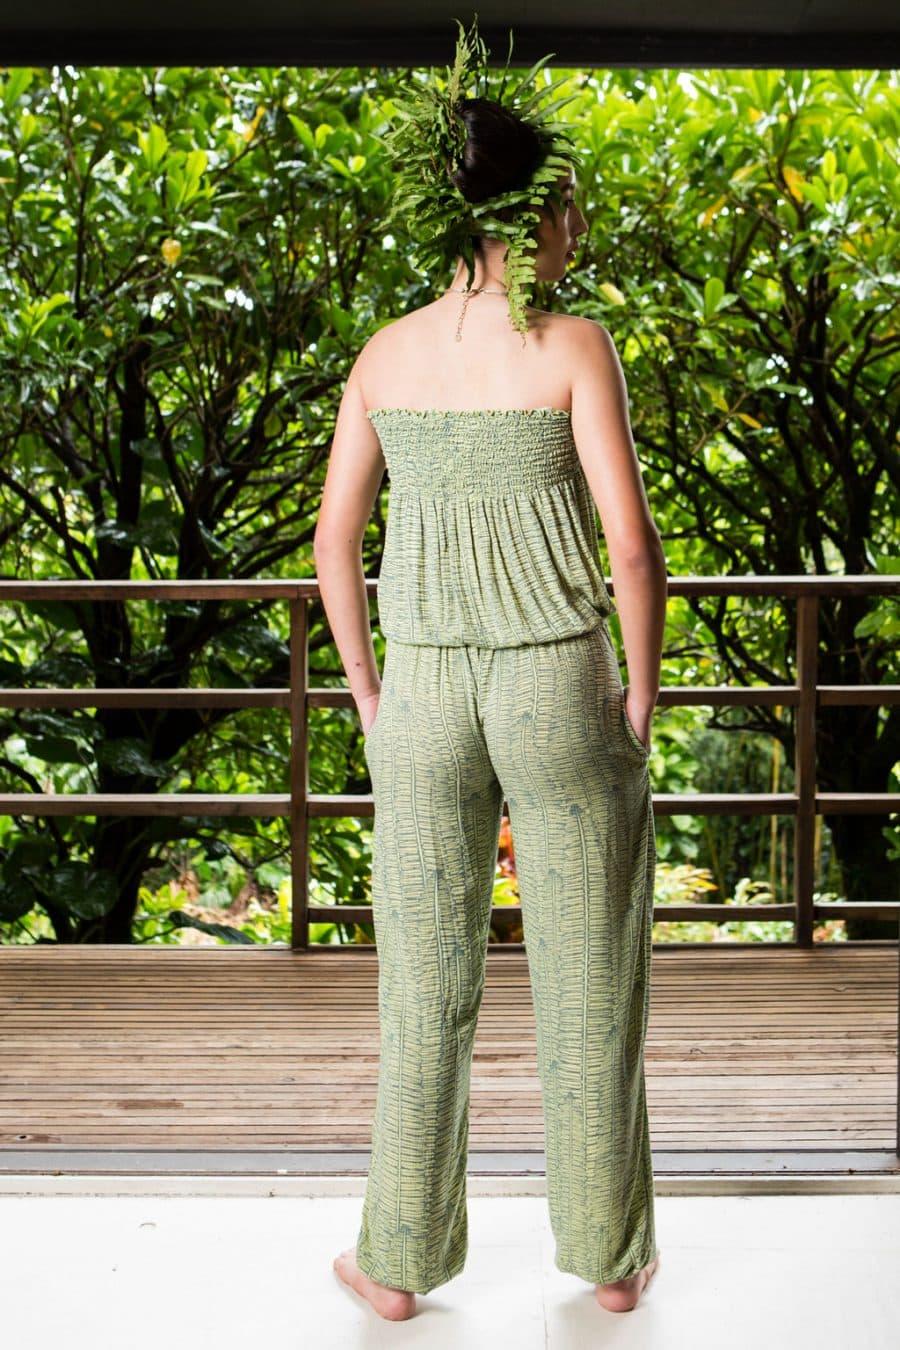 Model wearing Nanea Jumpsuit in Margarita Lily Pad Kupukupu back view